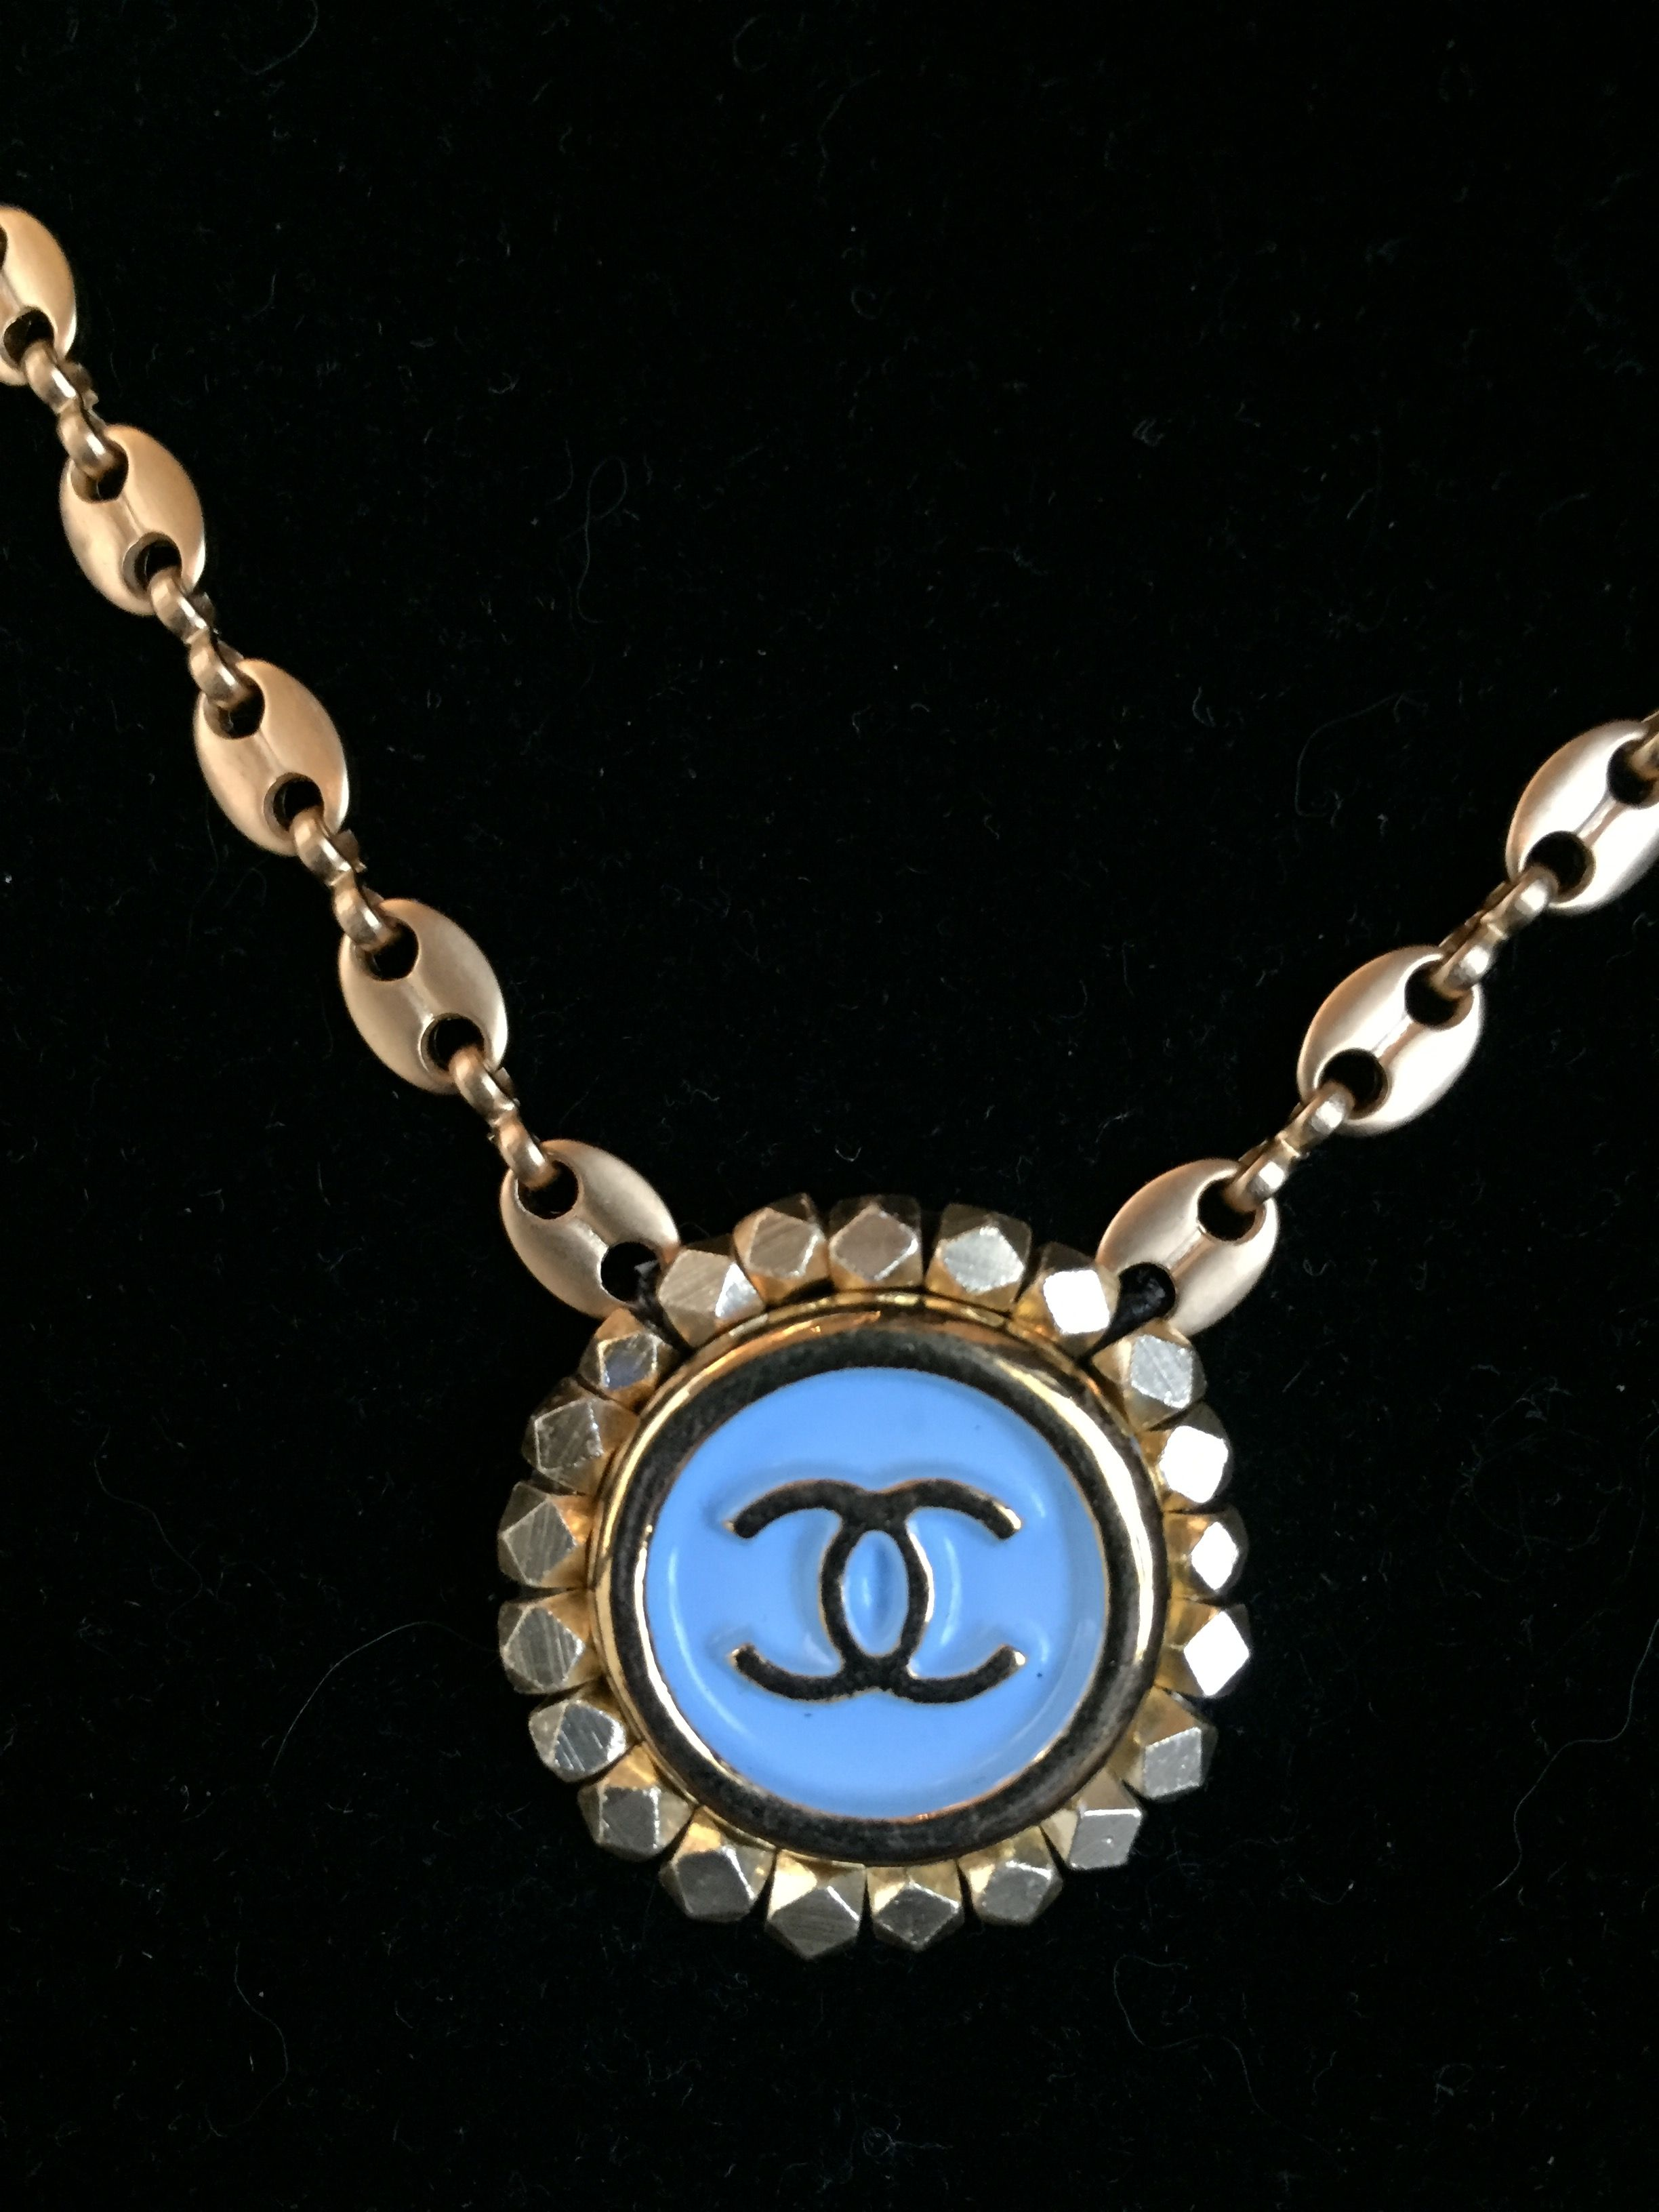 Chanel French Inspired Jewelry Chanel Jewelry Jewelry